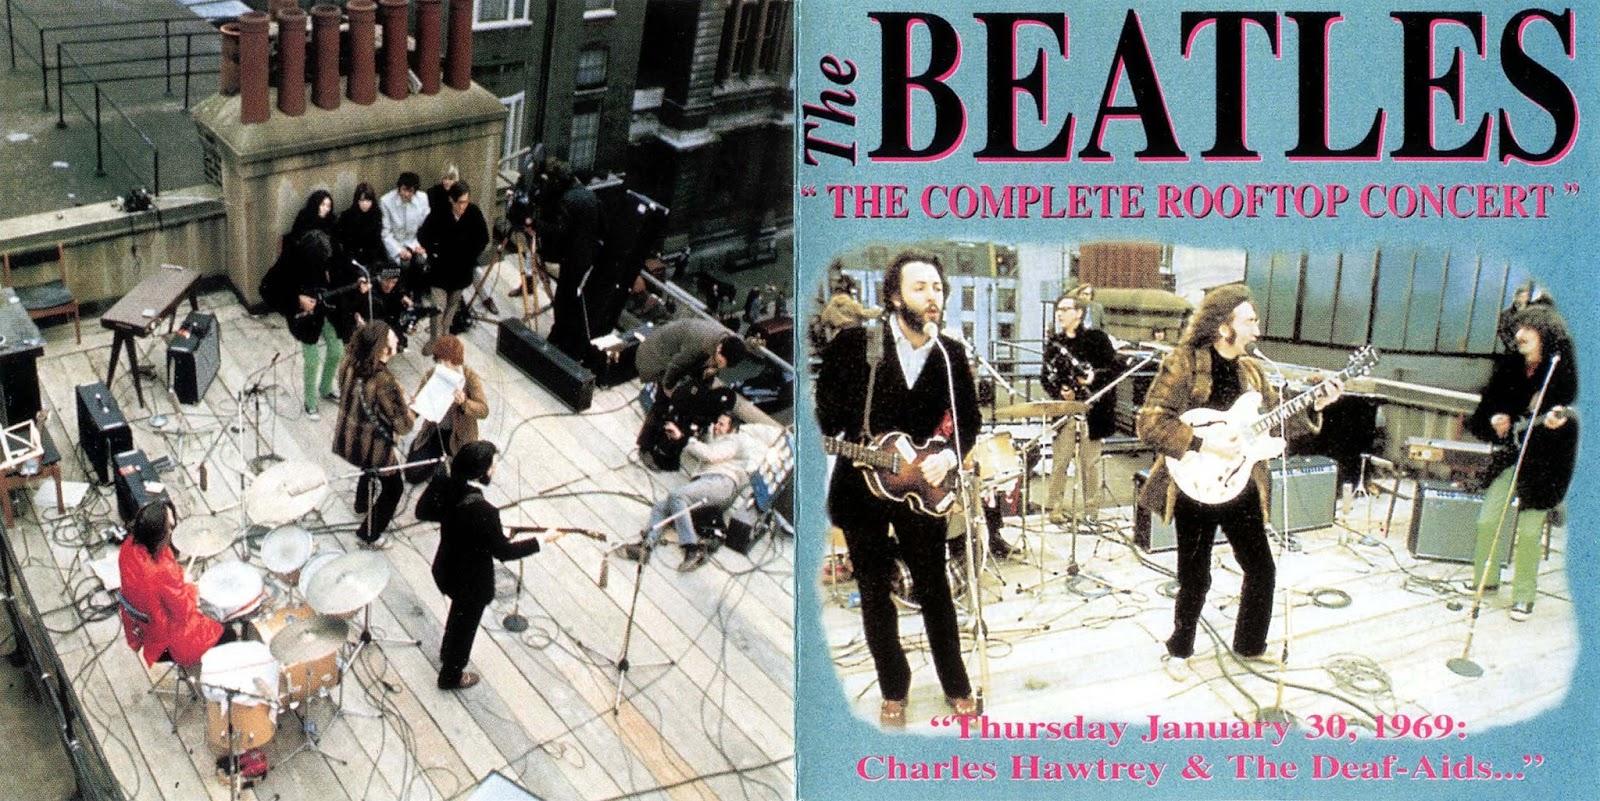 beatles rooftop concert full version video